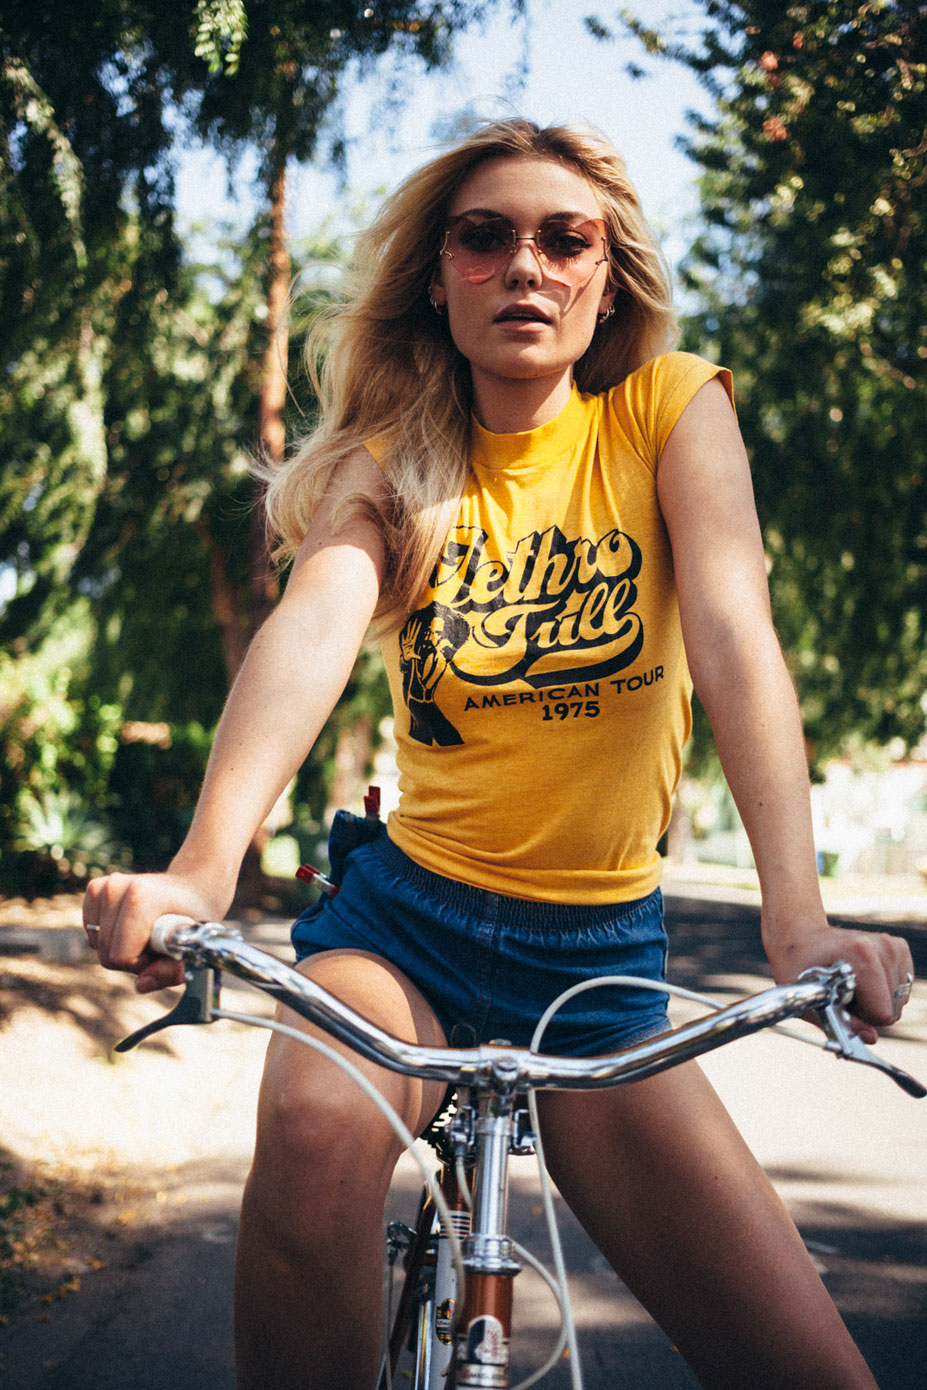 На велосипеде и в бассейне - Фара Холт / Farah Holt - Off The Rails Magazine